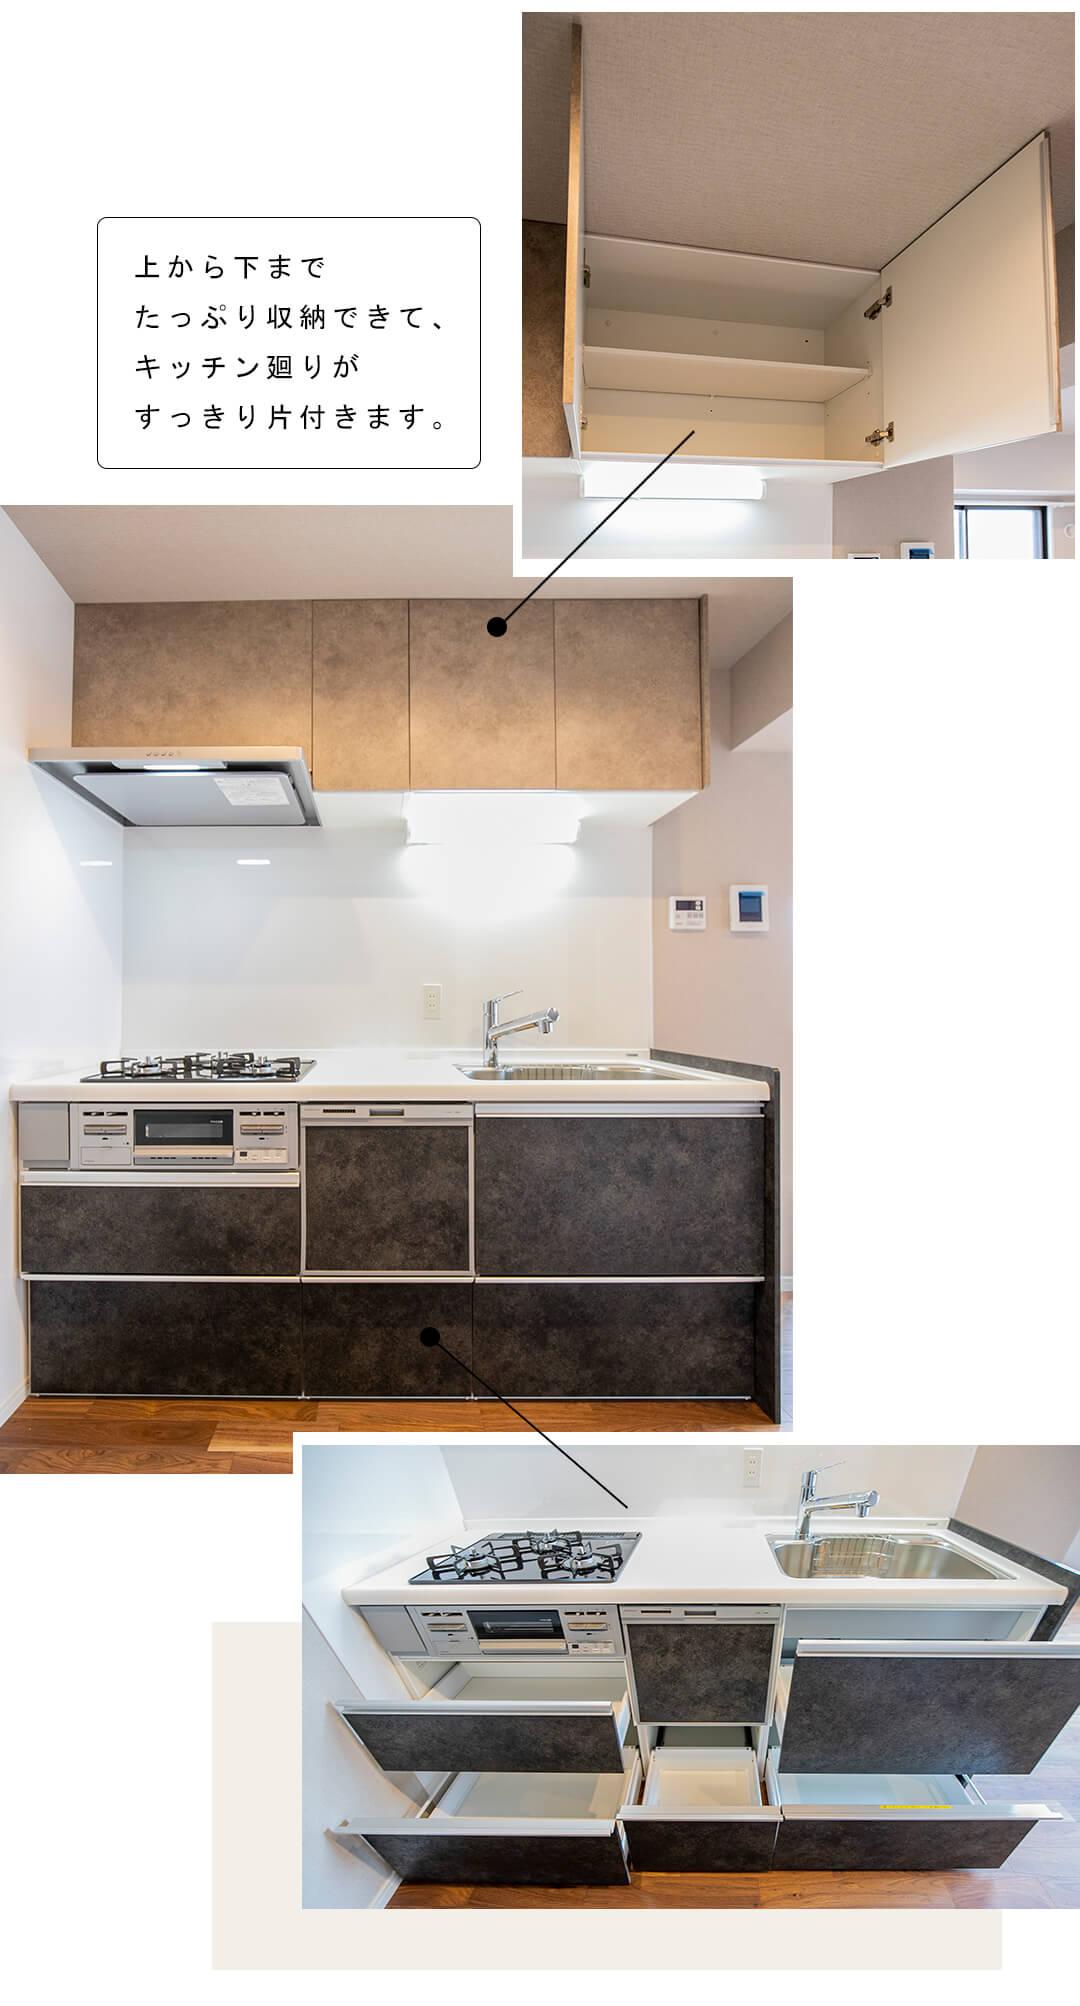 DOM経堂マンションのキッチン